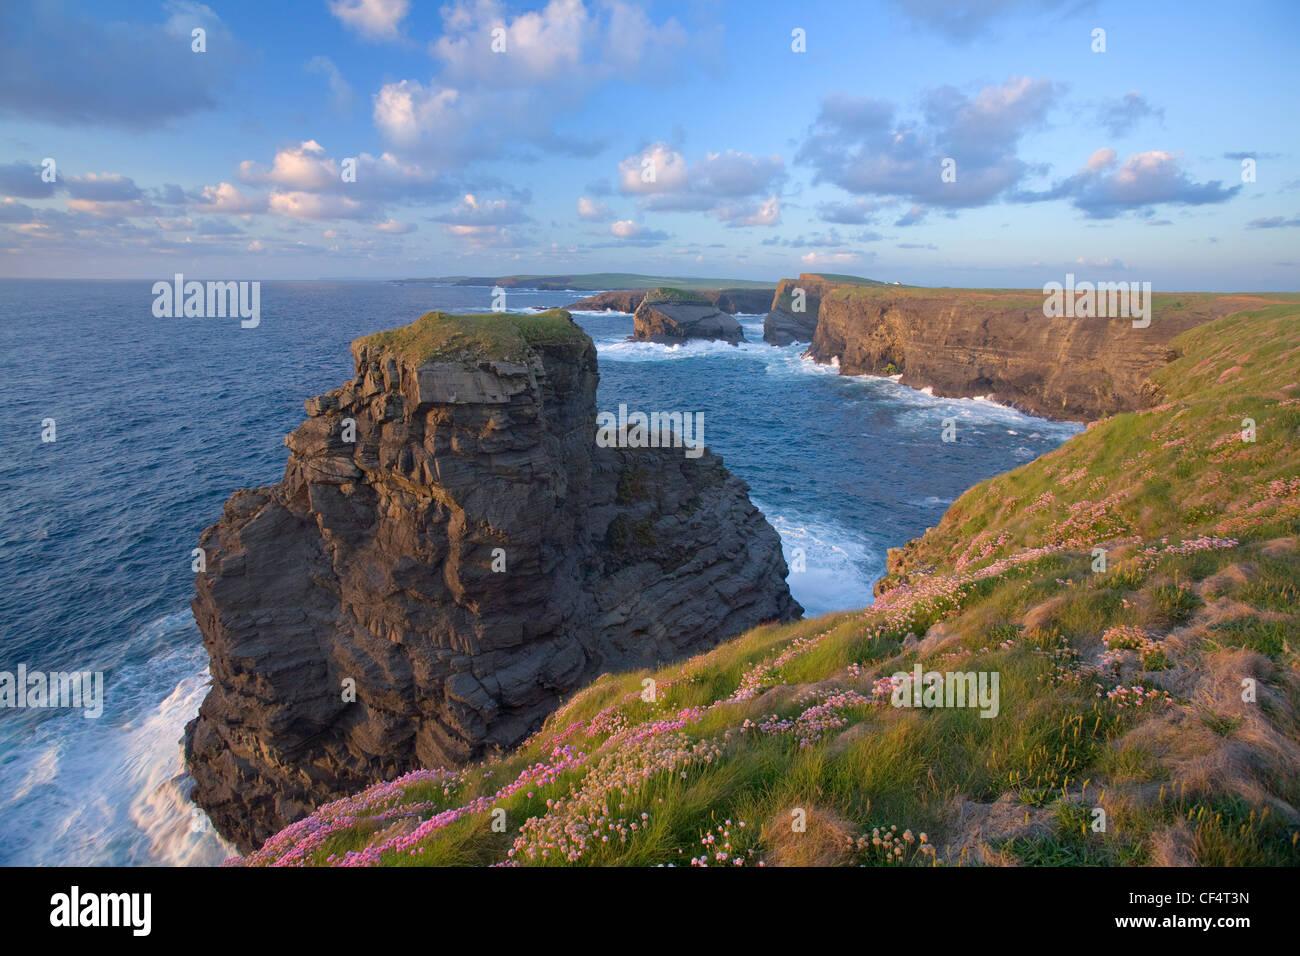 Coastal thrift carpeting the cliffs near Loop Head, County Clare, Ireland. - Stock Image